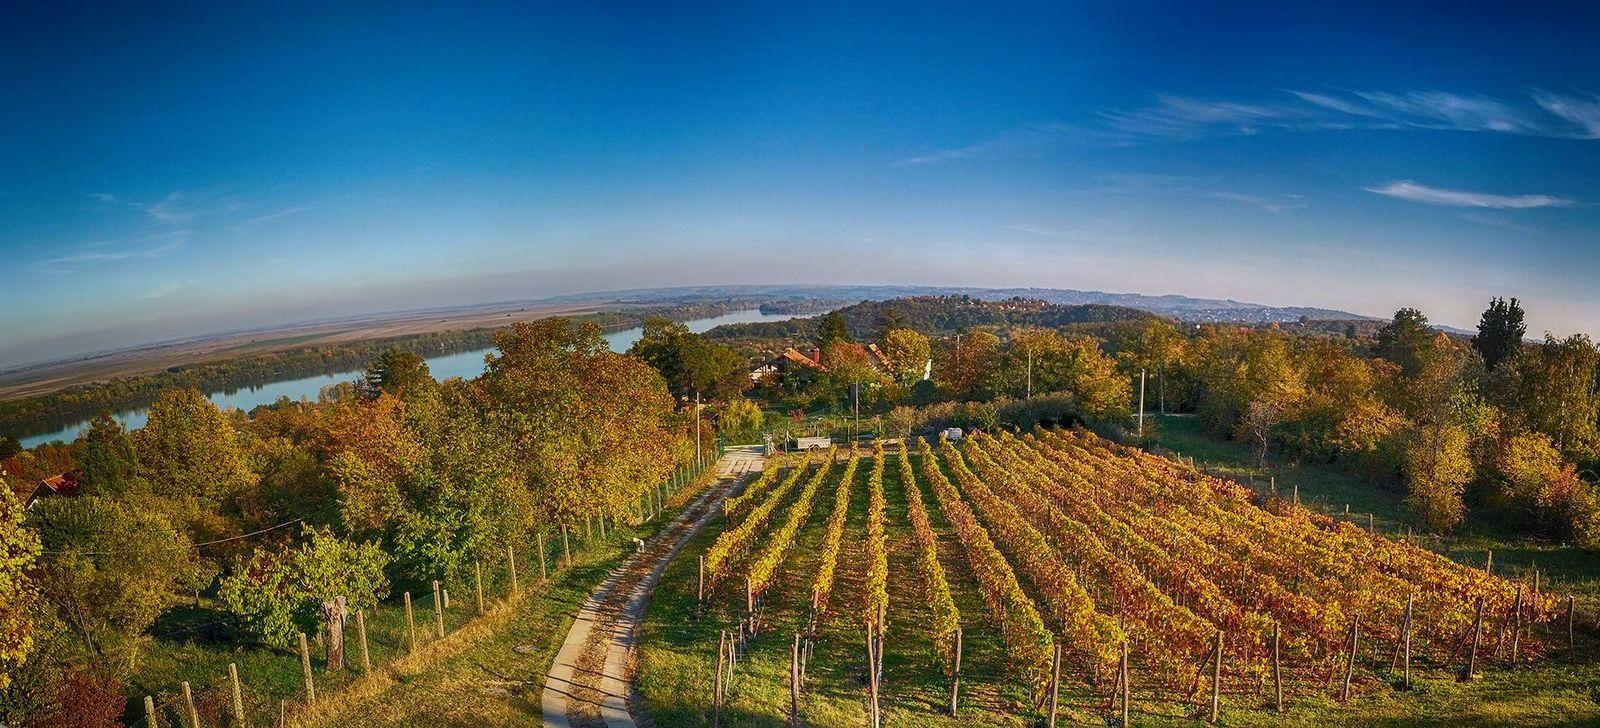 vinarija_plavinci_paorama_jesen